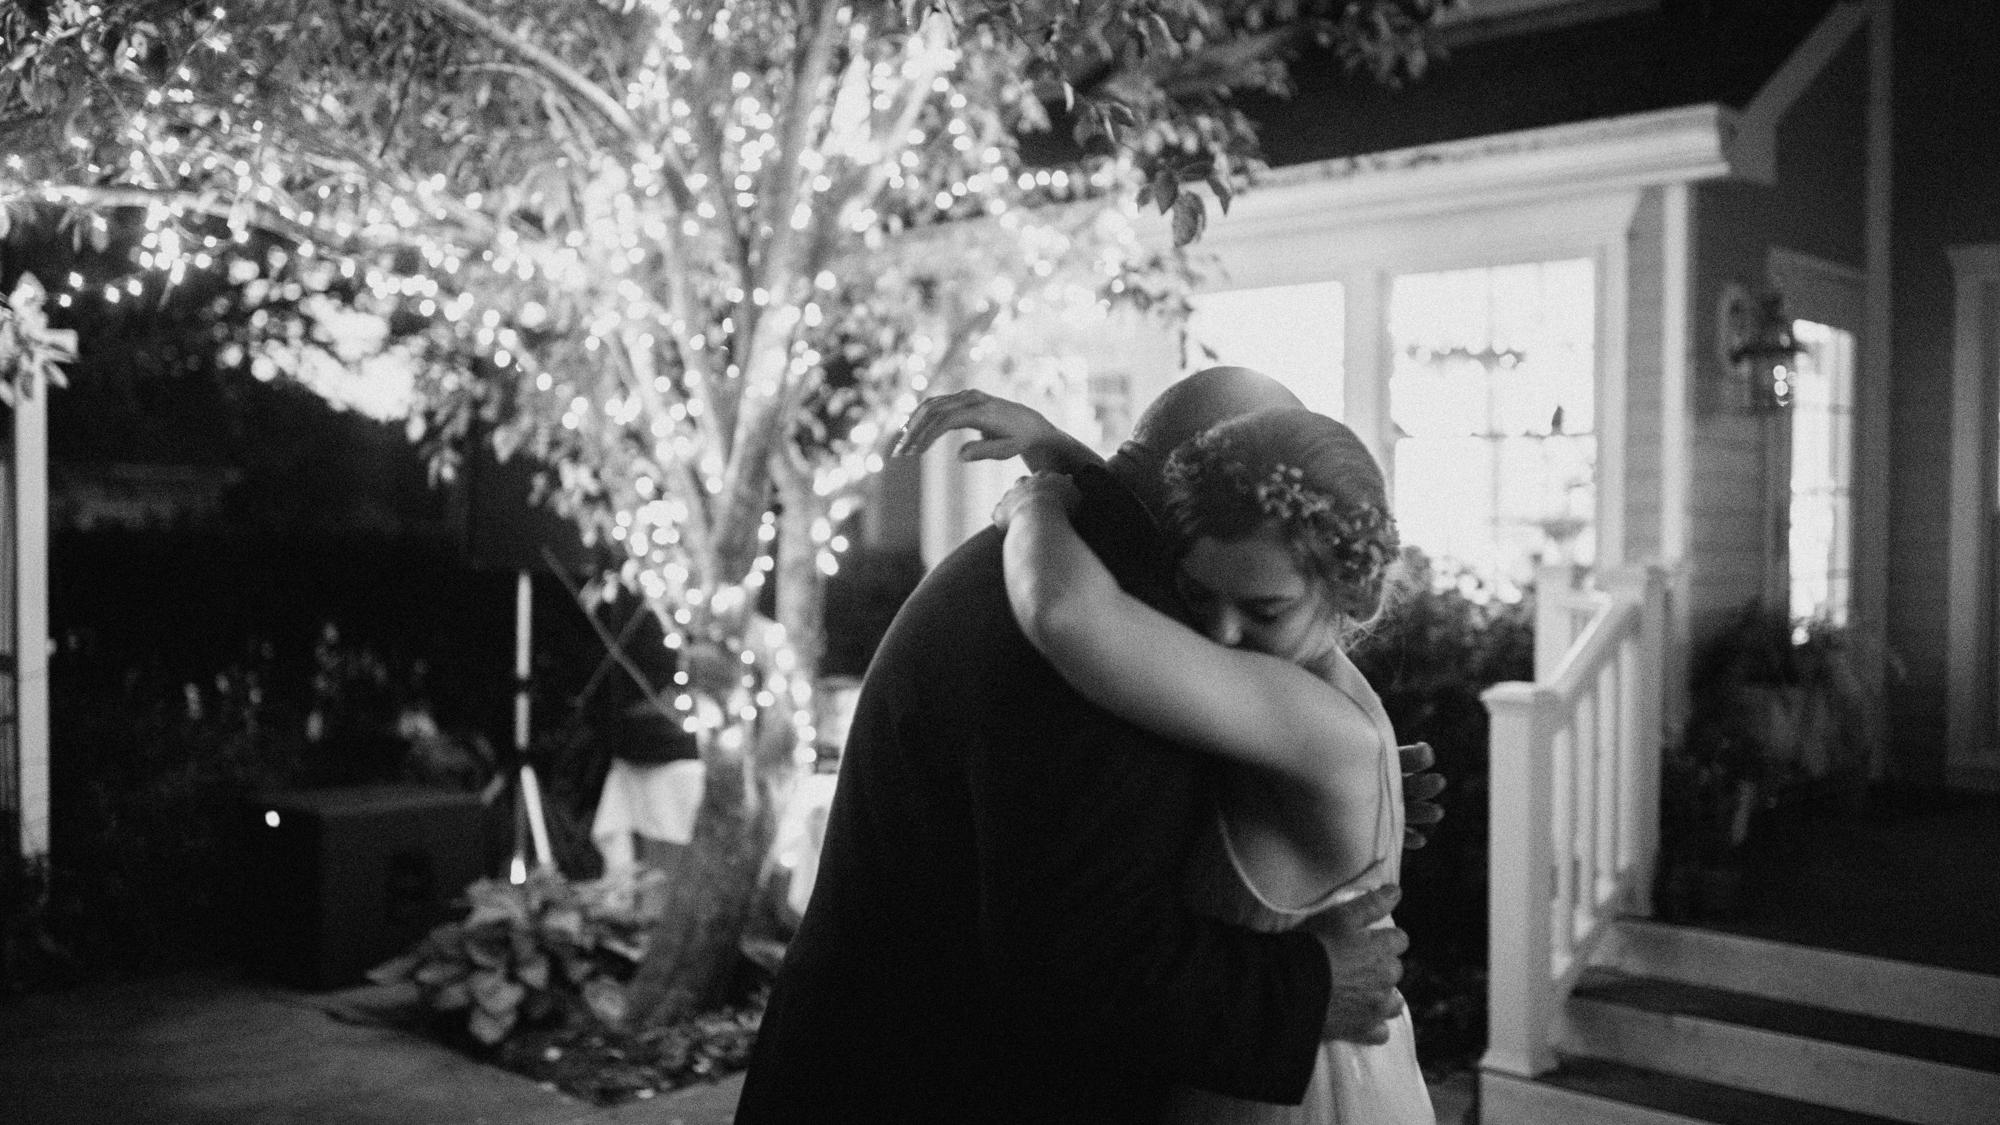 alec_vanderboom_kansas_city_mo_wedding_photos-0078.jpg